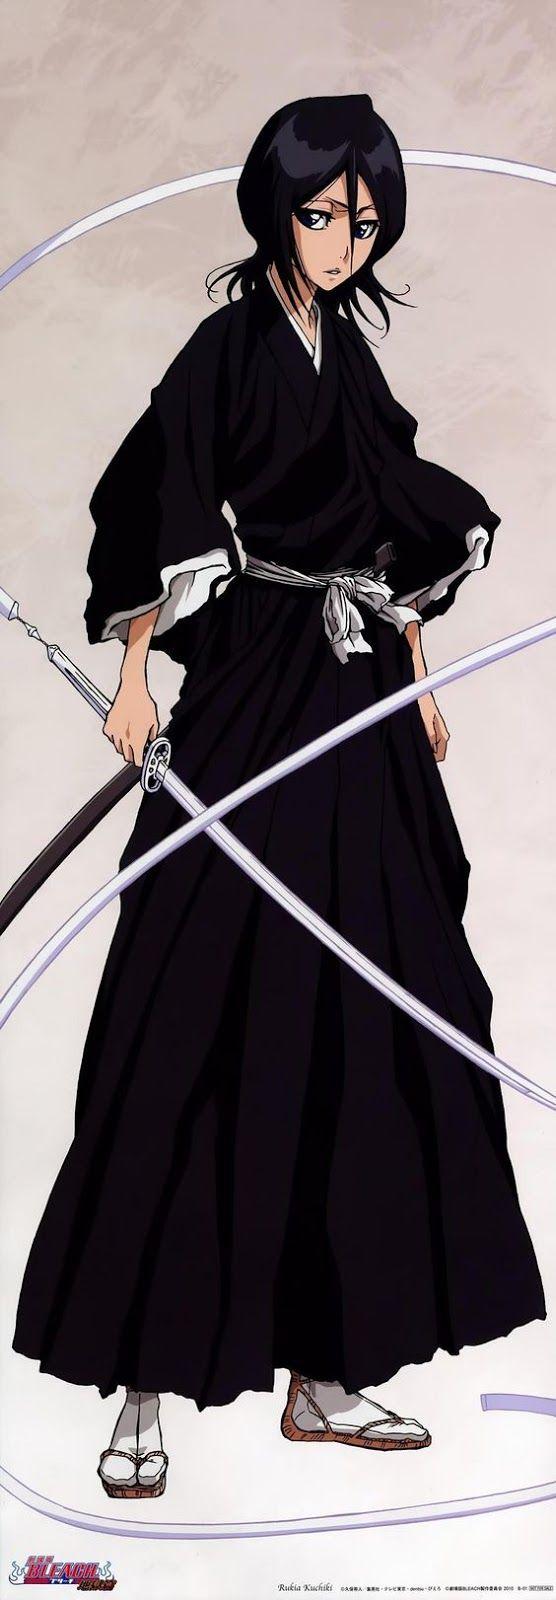 Indo além da caixinha: Rukia Kuchiki